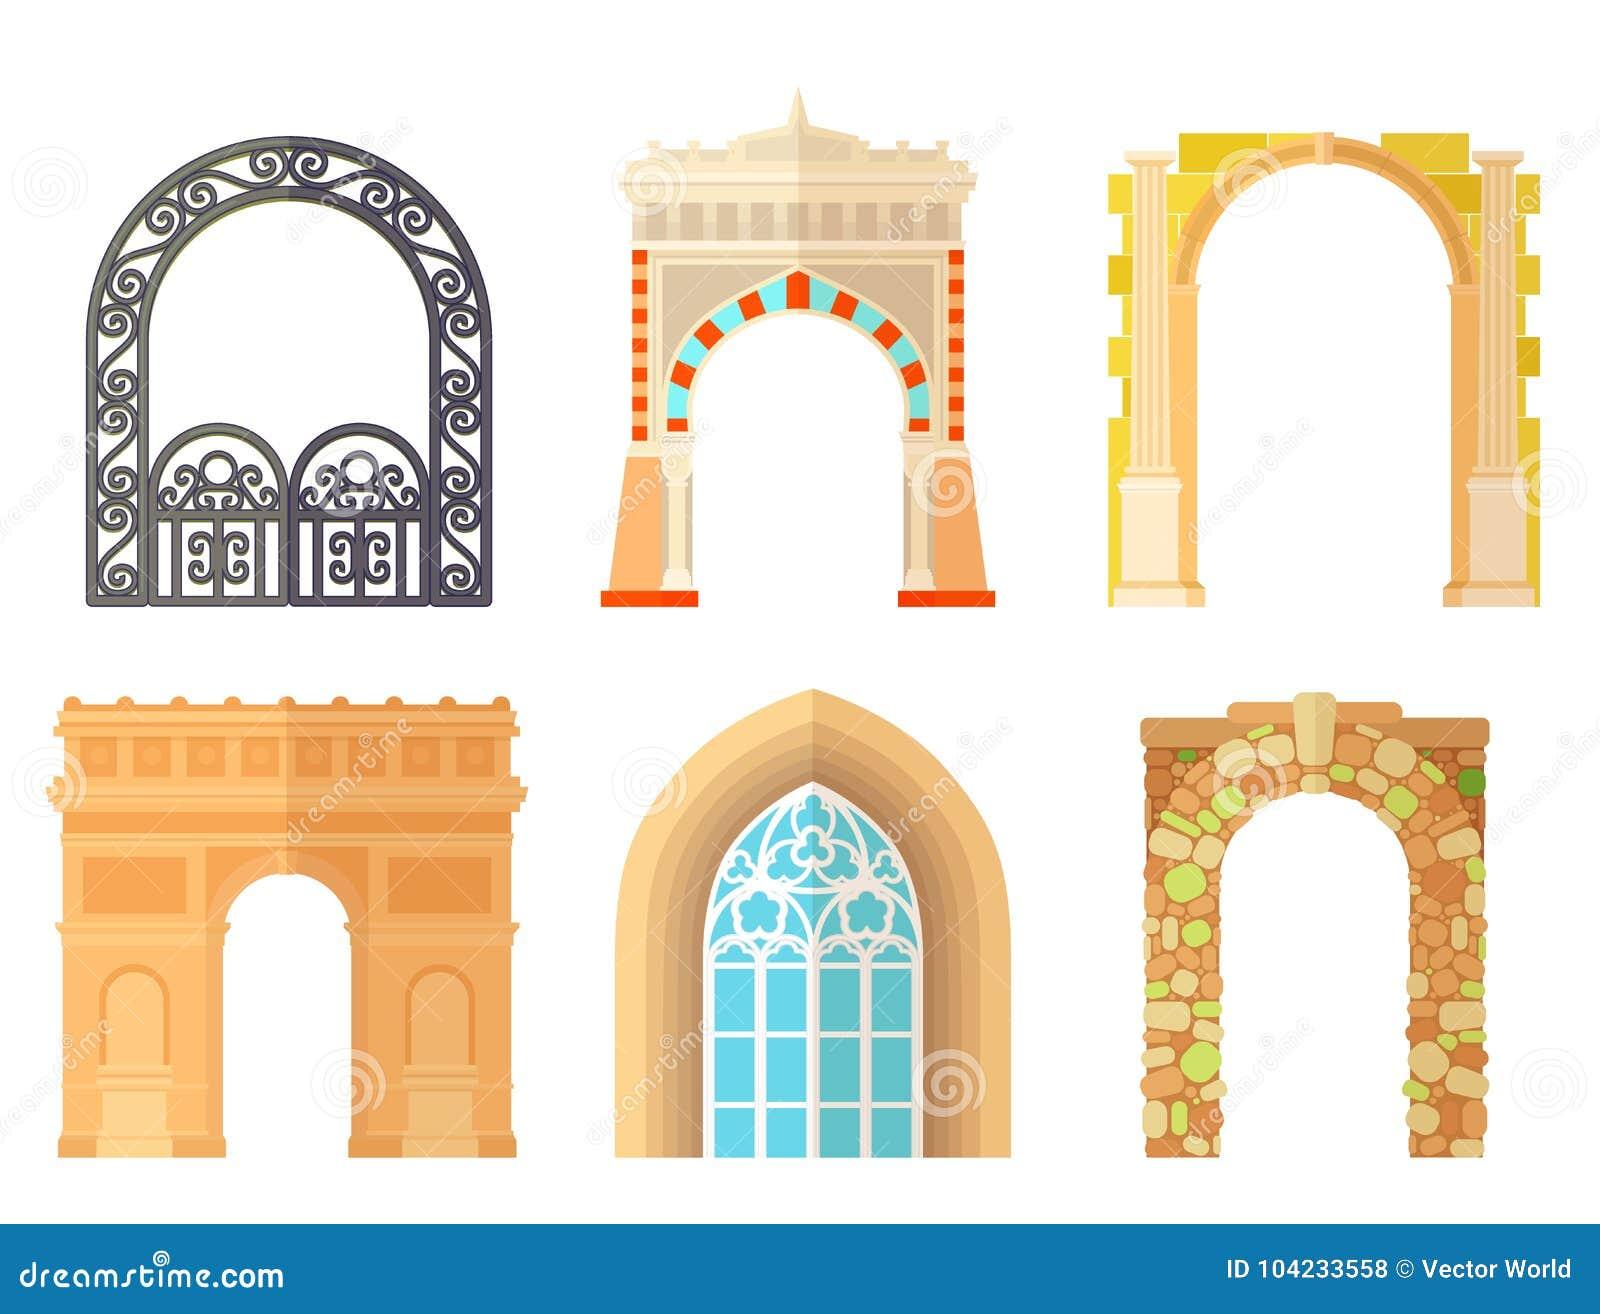 5b81e0fe4e22 Architecture Frame Stock Illustrations – 81